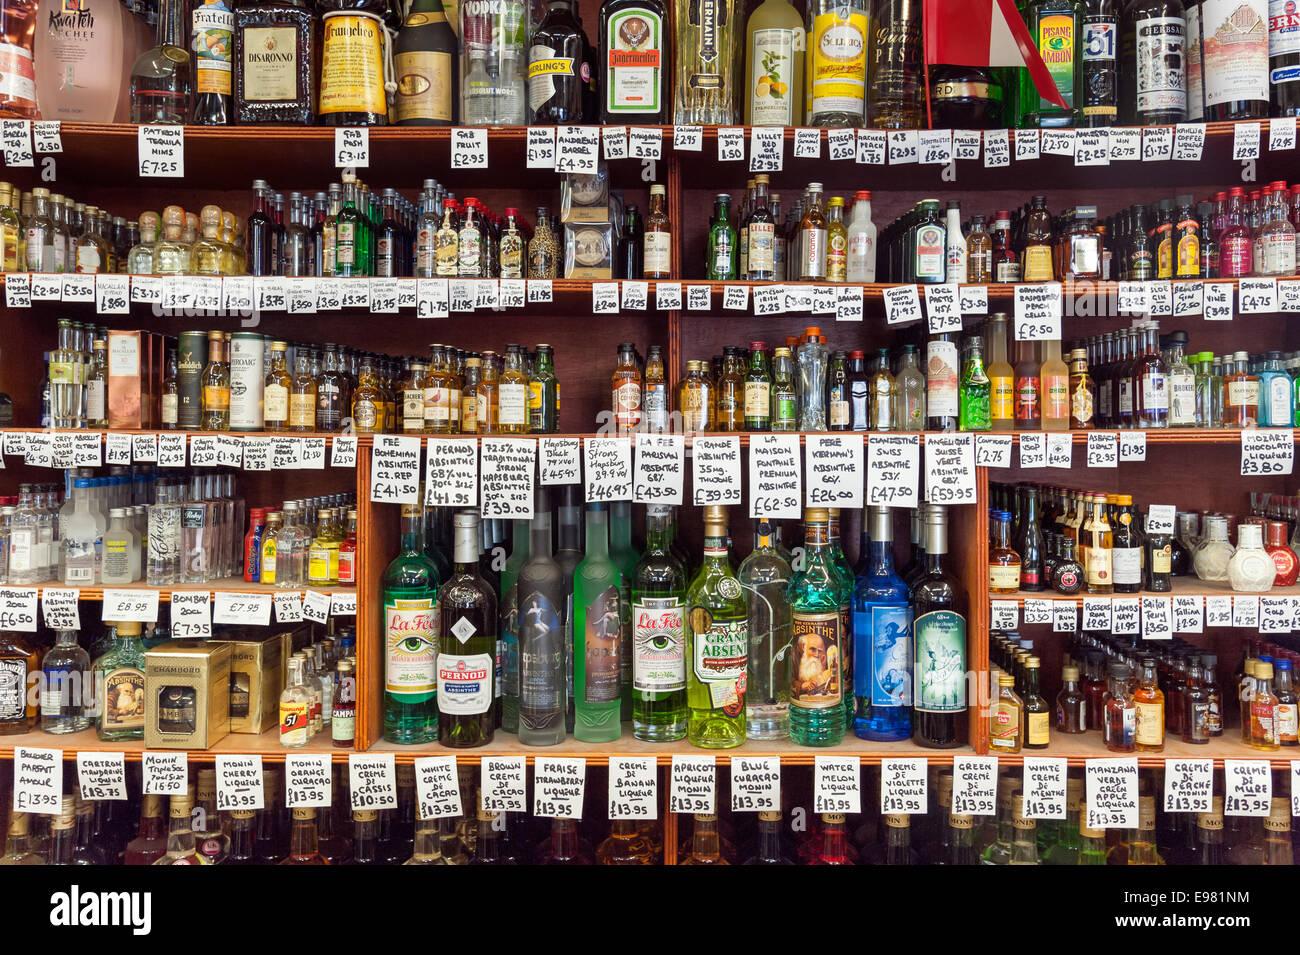 Große Auswahl an alkoholischen Getränken bei Gerrys Wein ...